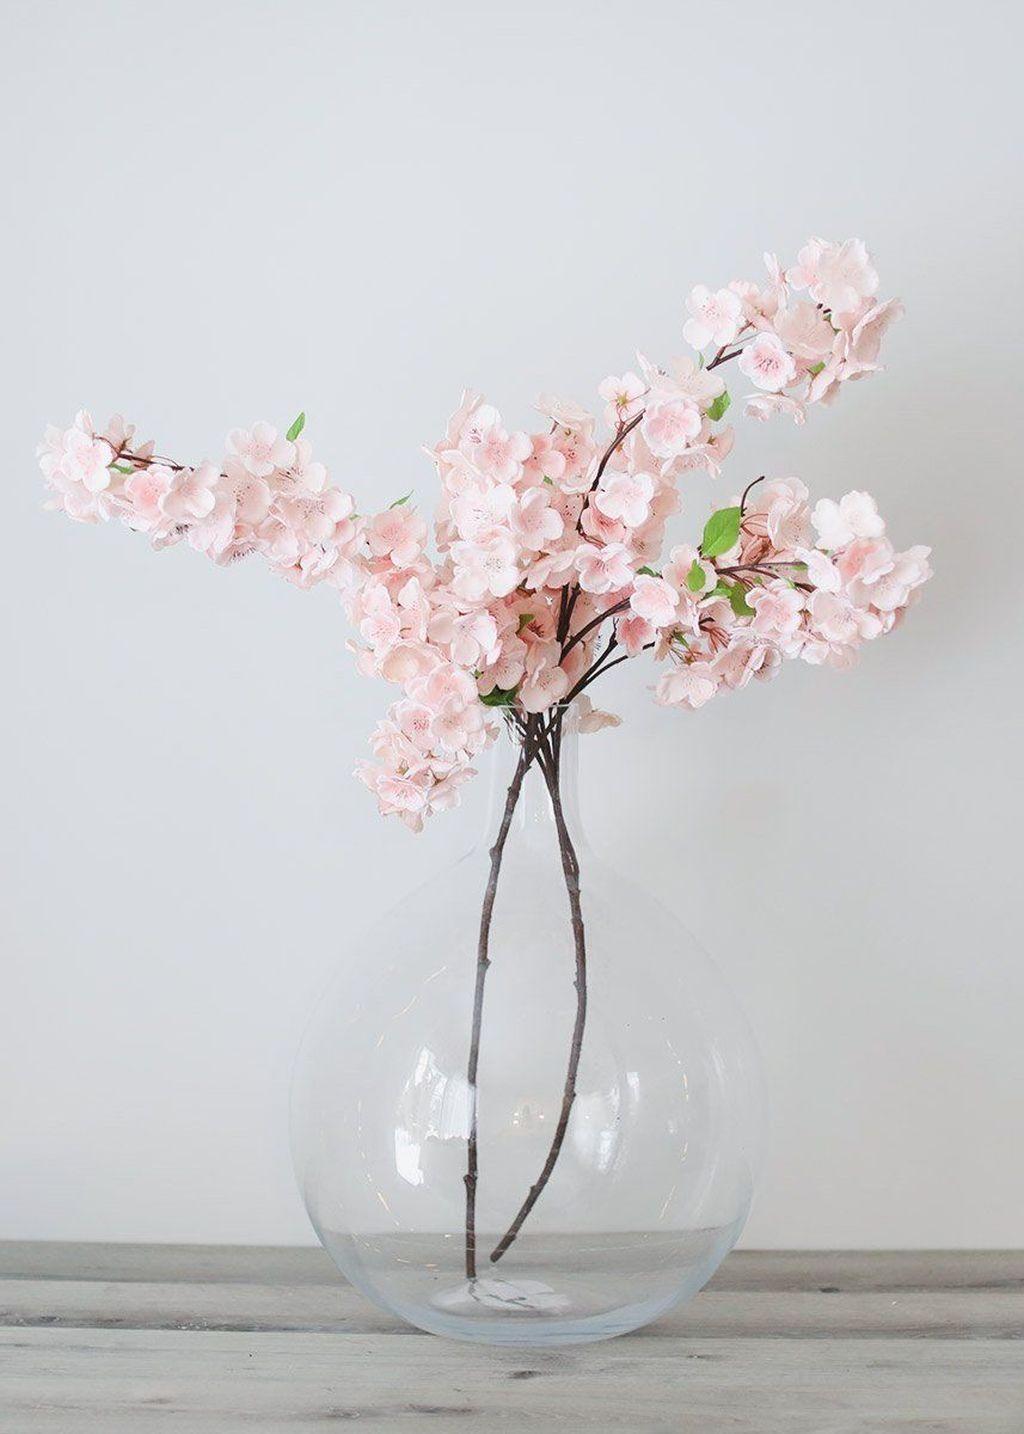 40 Pretty Flower Arrangement Ideas For Home Artificial Flower Arrangements Flower Decorations Cherry Blossom Flowers